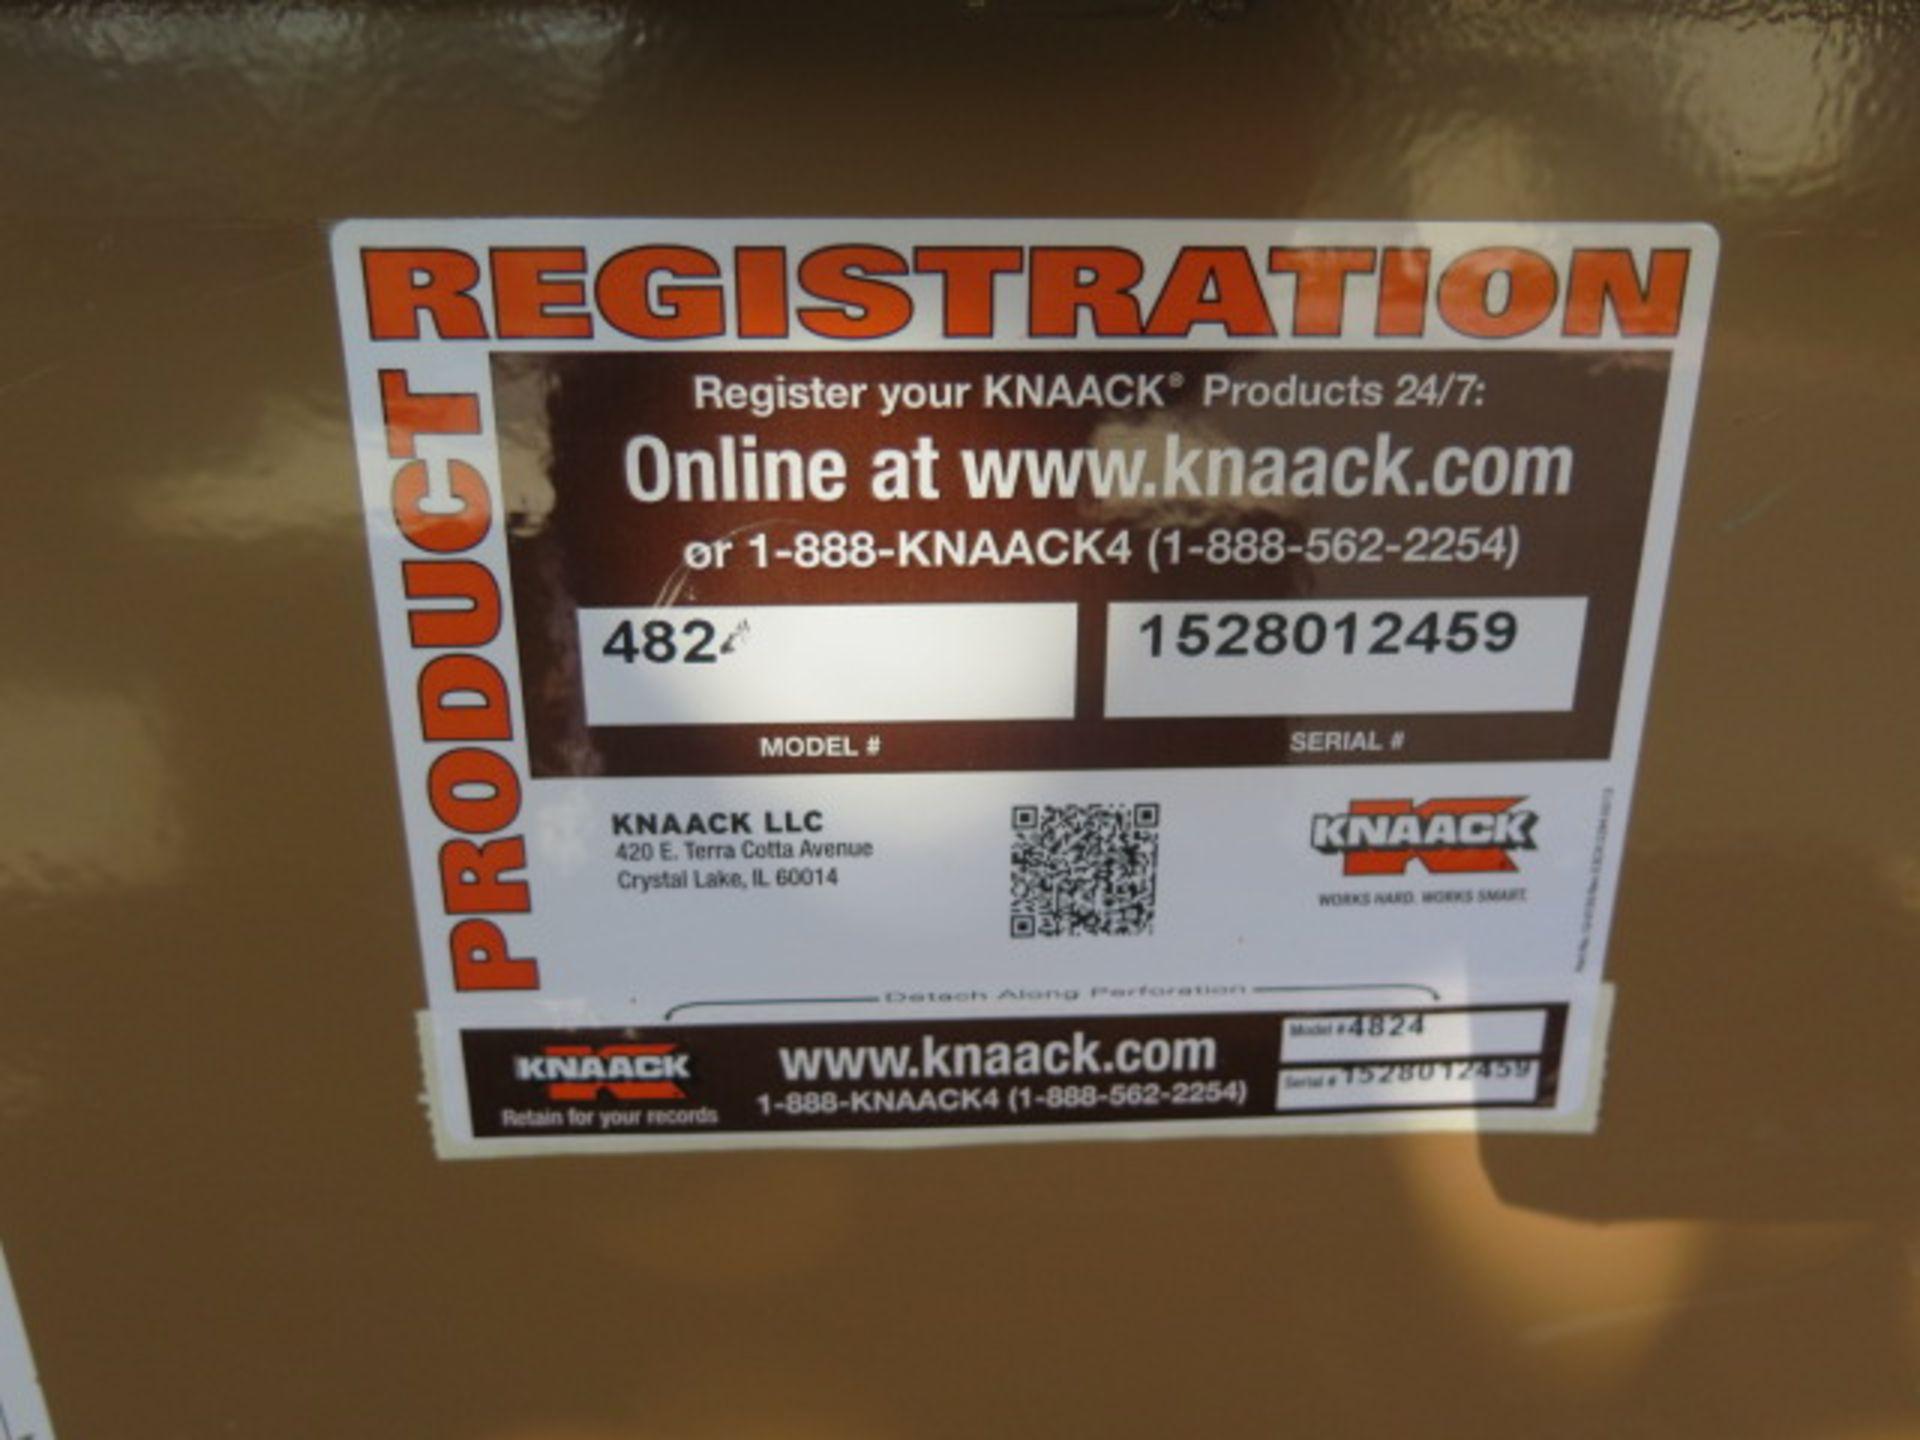 Knaack mdl. 4824 Rolling Job Box (SOLD AS-IS - NO WARRANTY) - Image 7 of 7